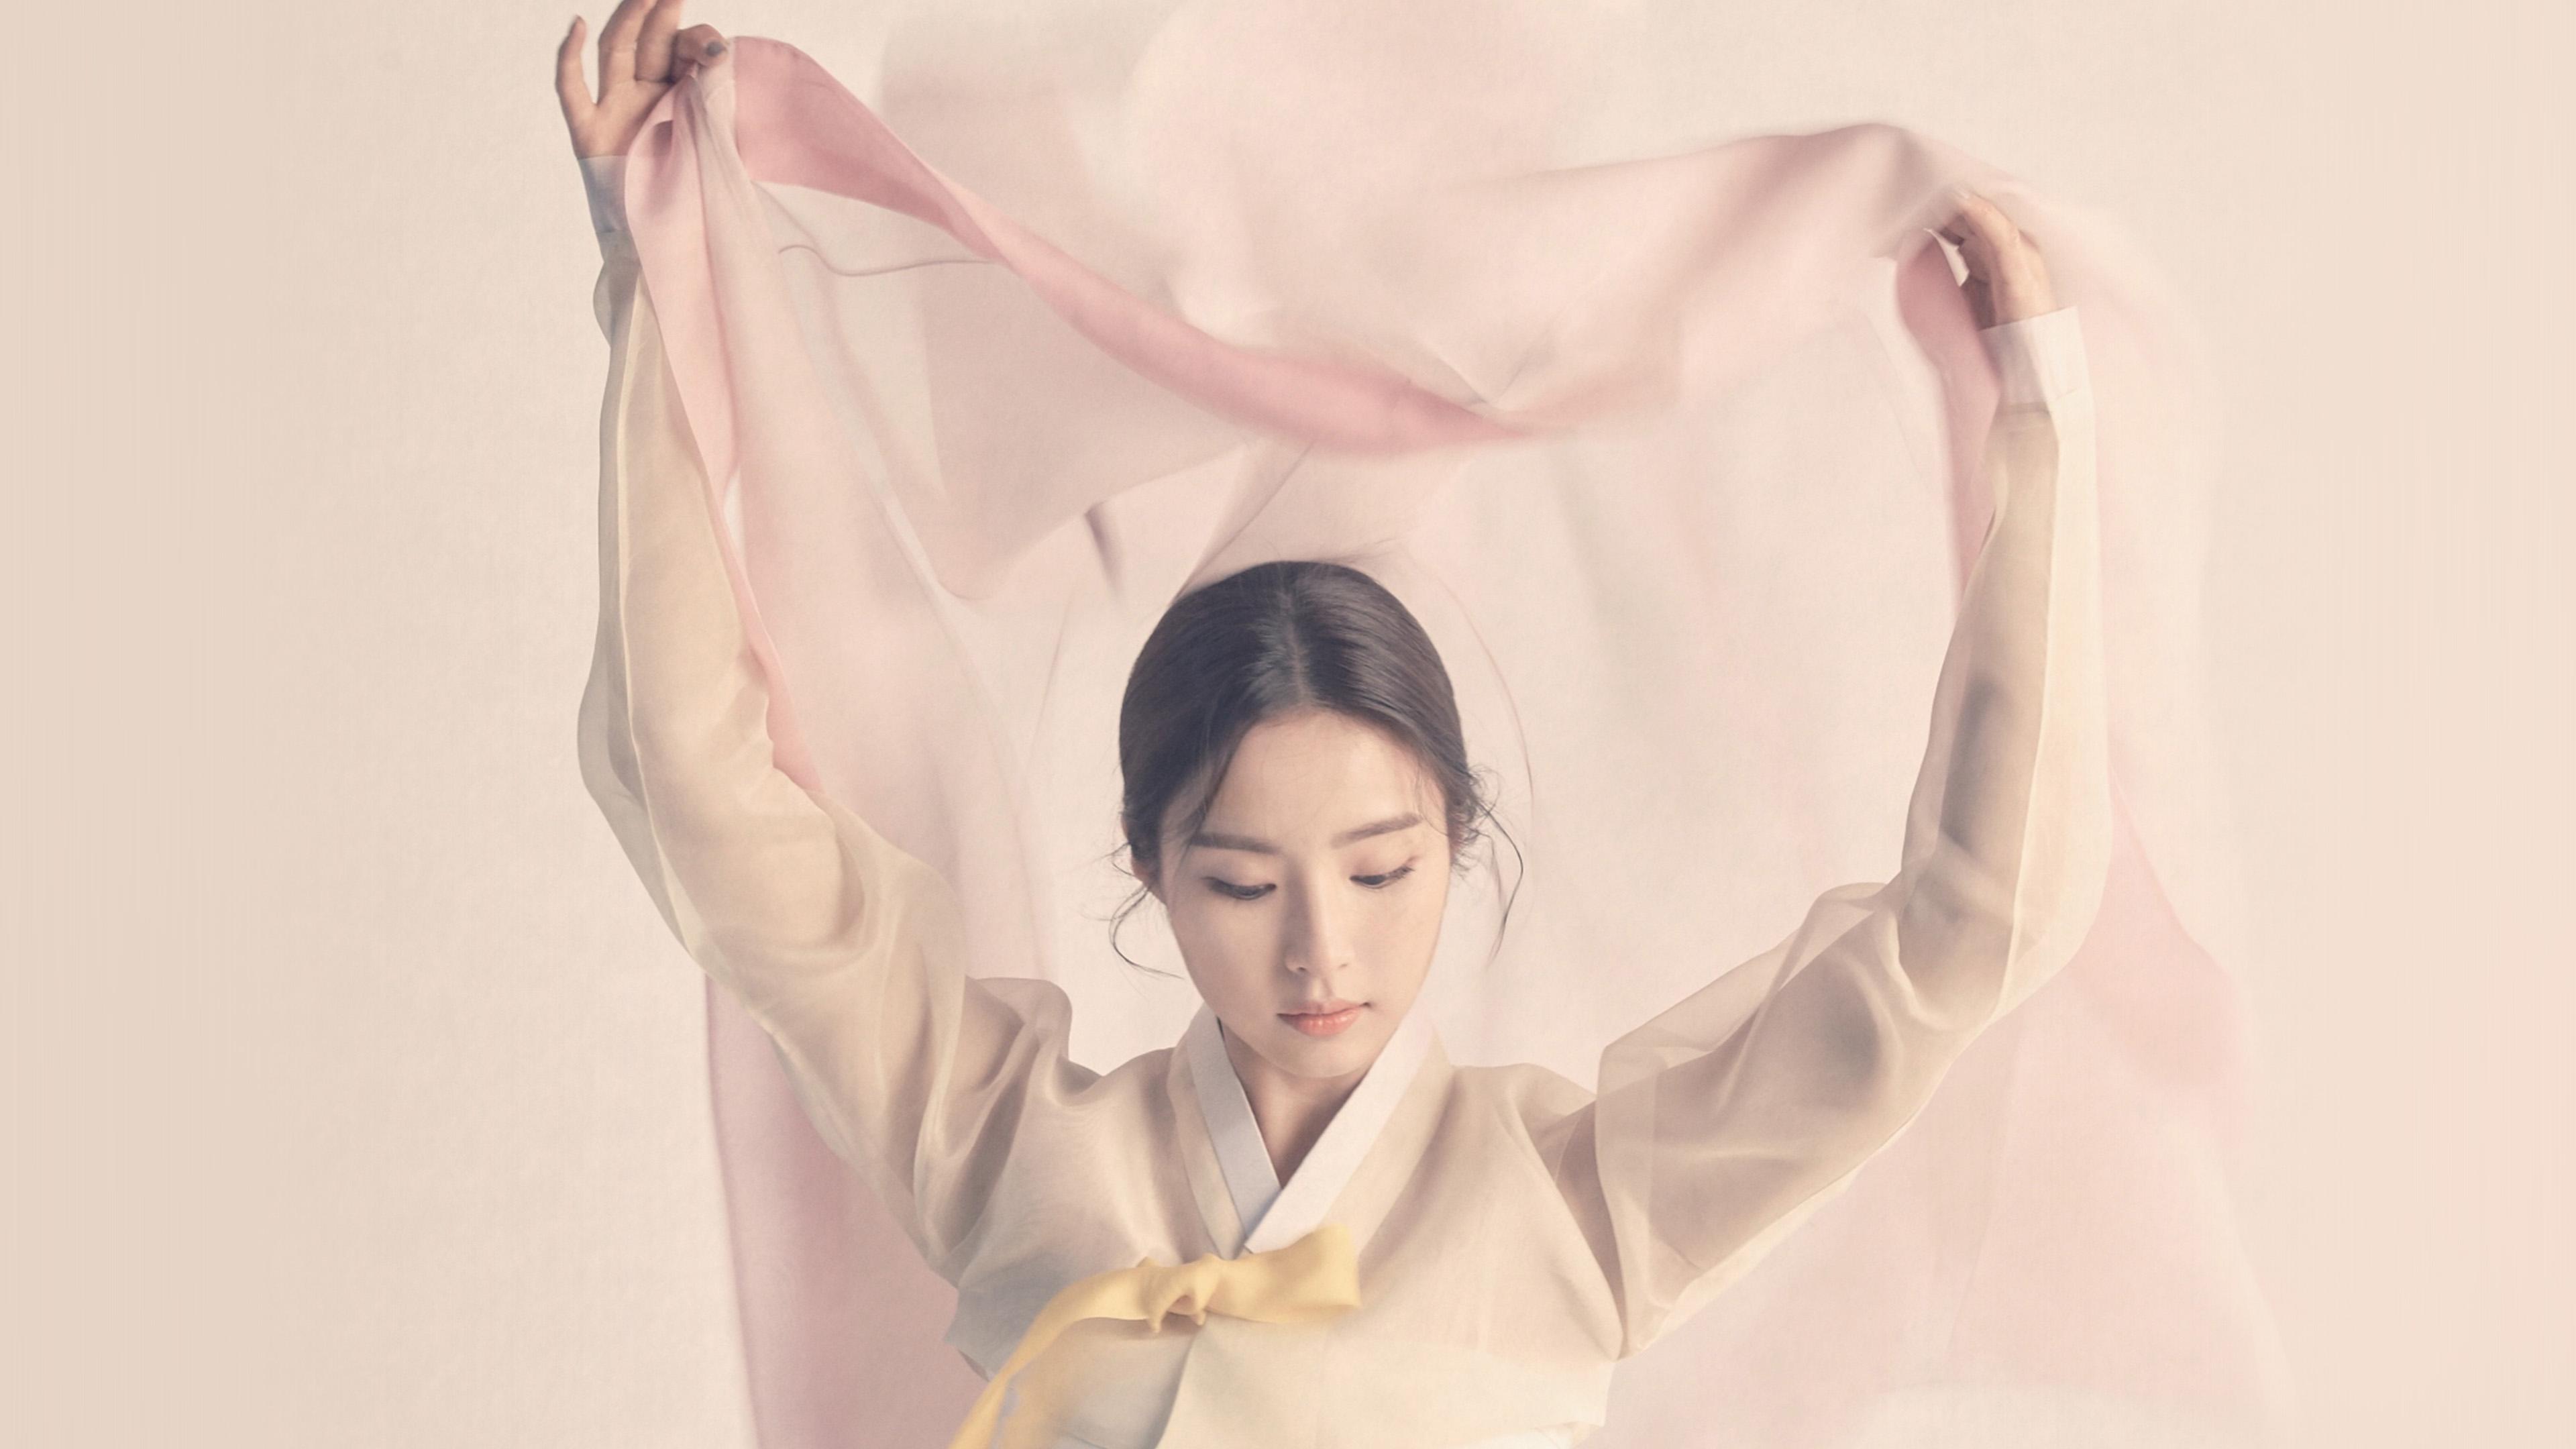 hp65-korean-asian-kpop-girl-dress-pink-wallpaper